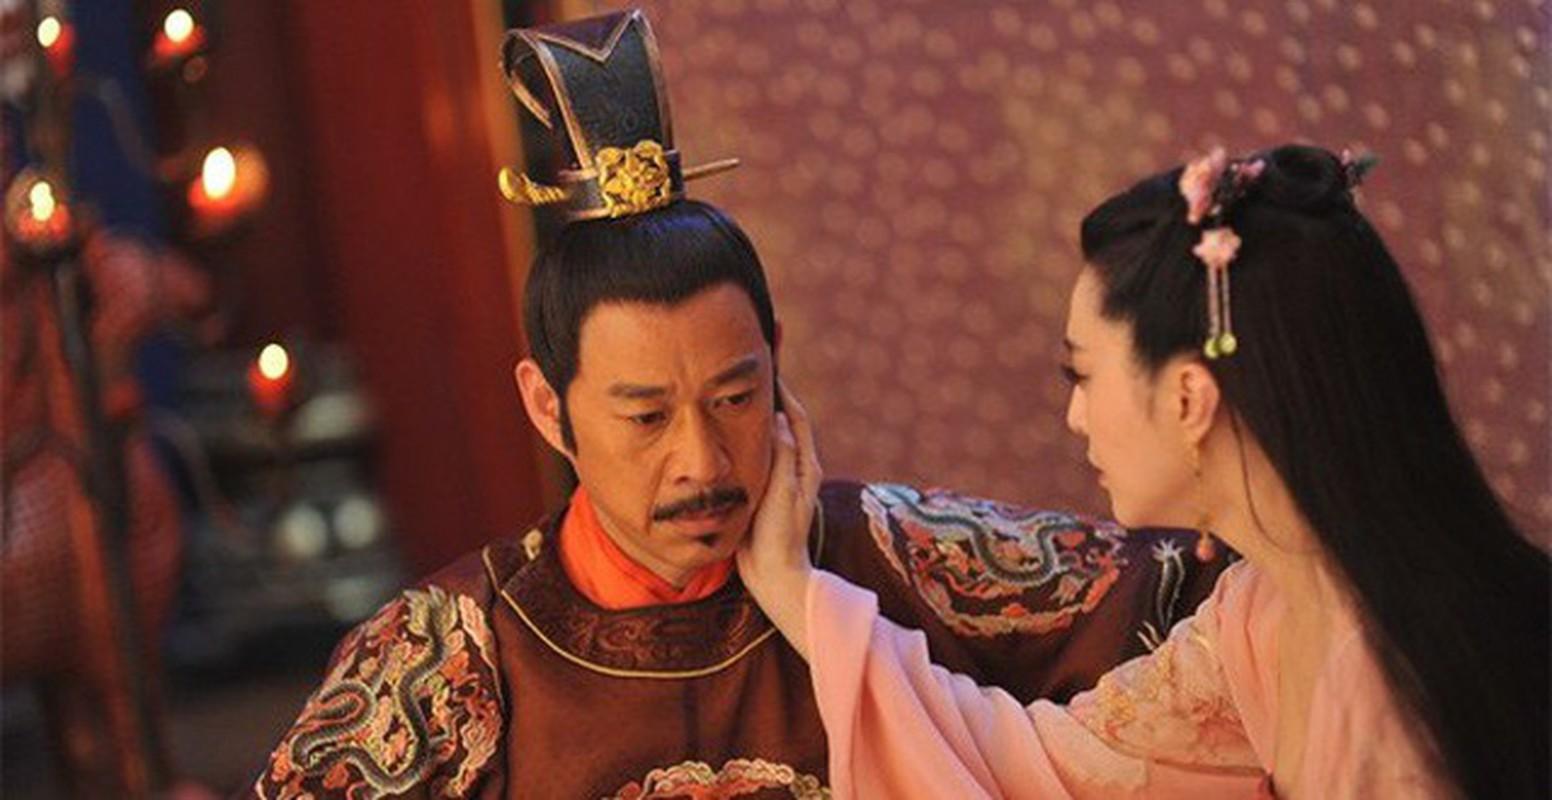 My nhan nha Duong beo mum mim van duoc vua dac sung-Hinh-7